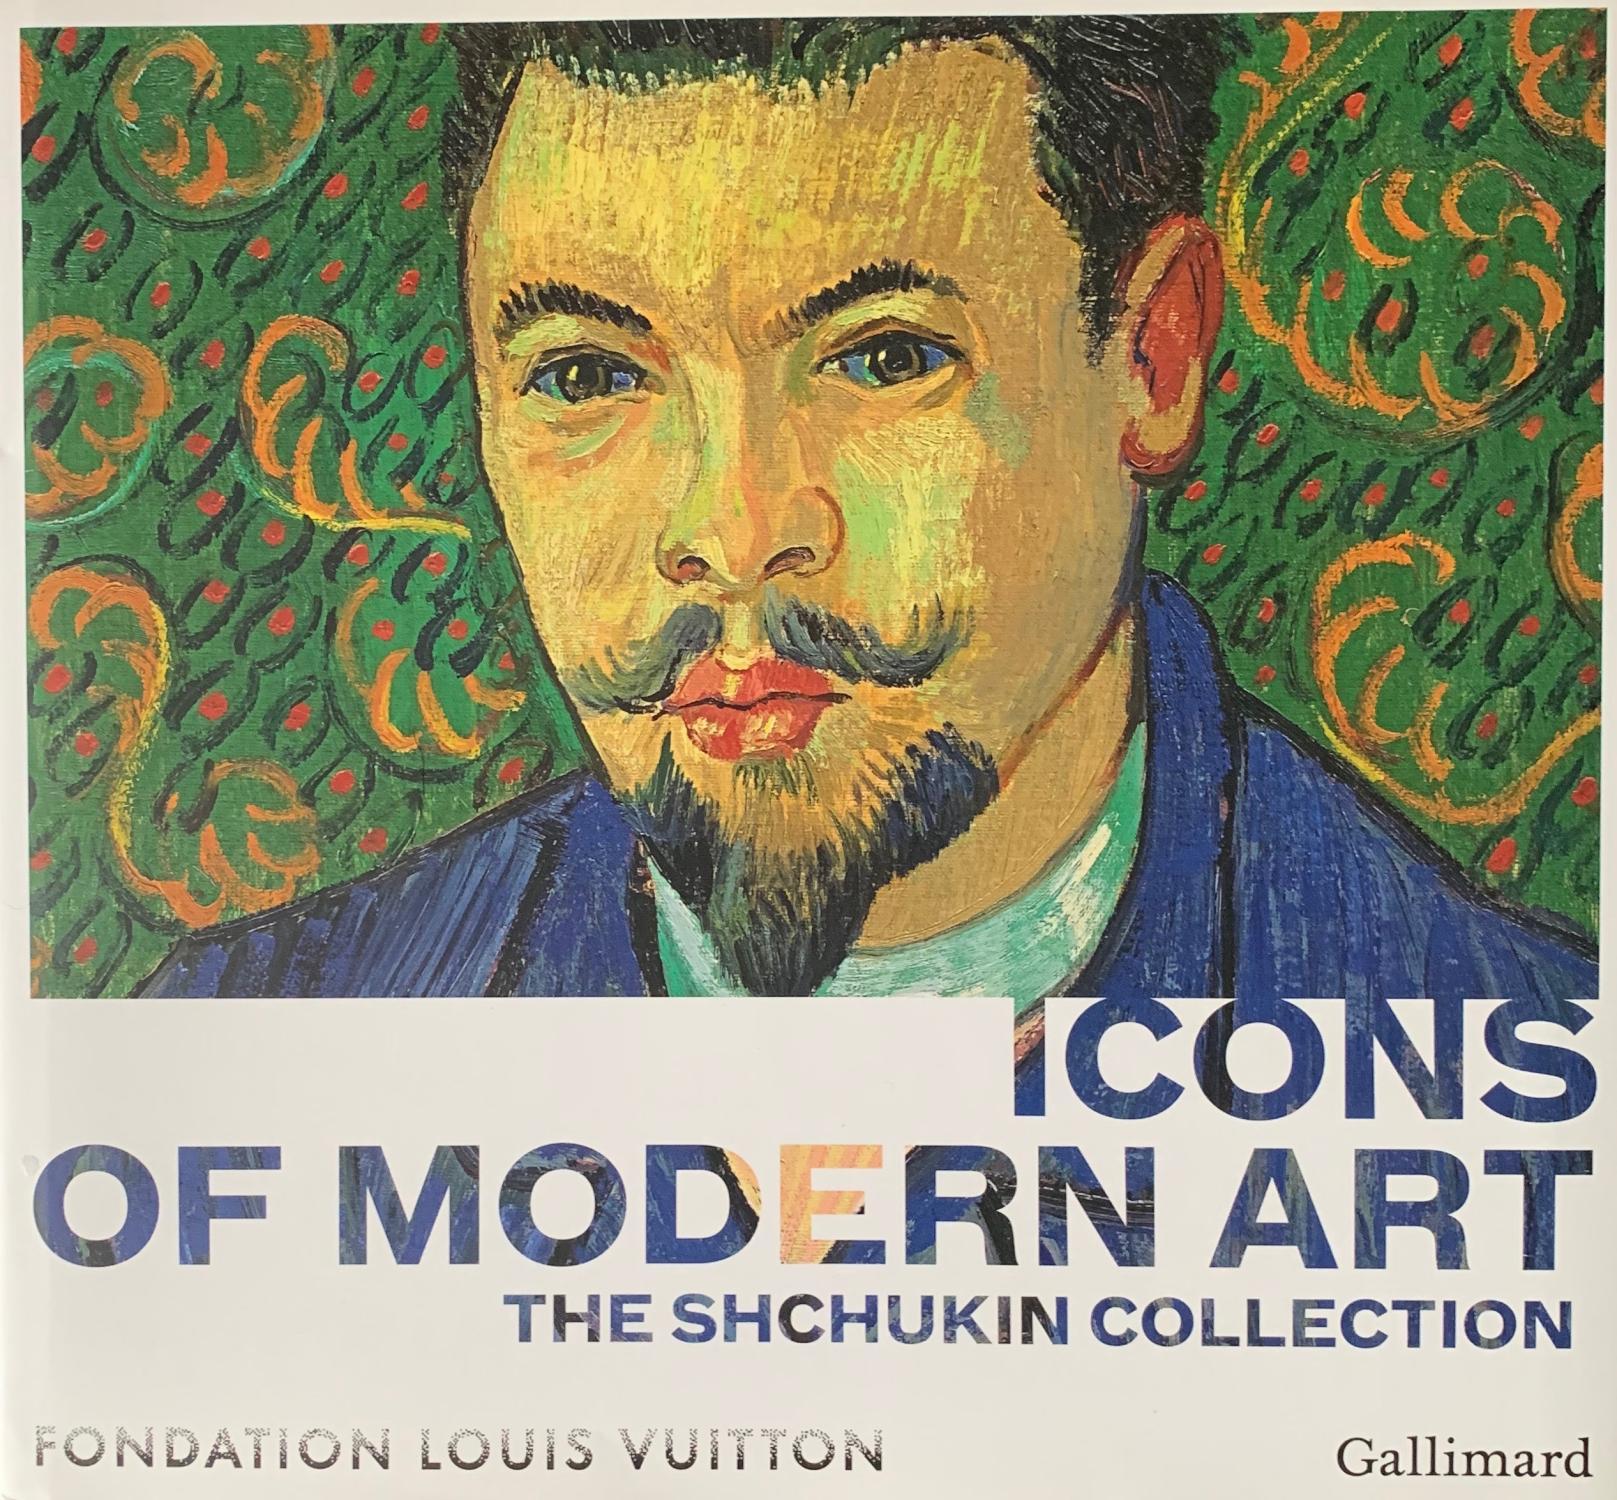 Icons of Modern Art. The Shchukin Collection.   [ ] [Couverture rigide] 4°. OPb. mit OU 478 S. Ausstellungskatalog Fondation Louis Vuitton, Paris